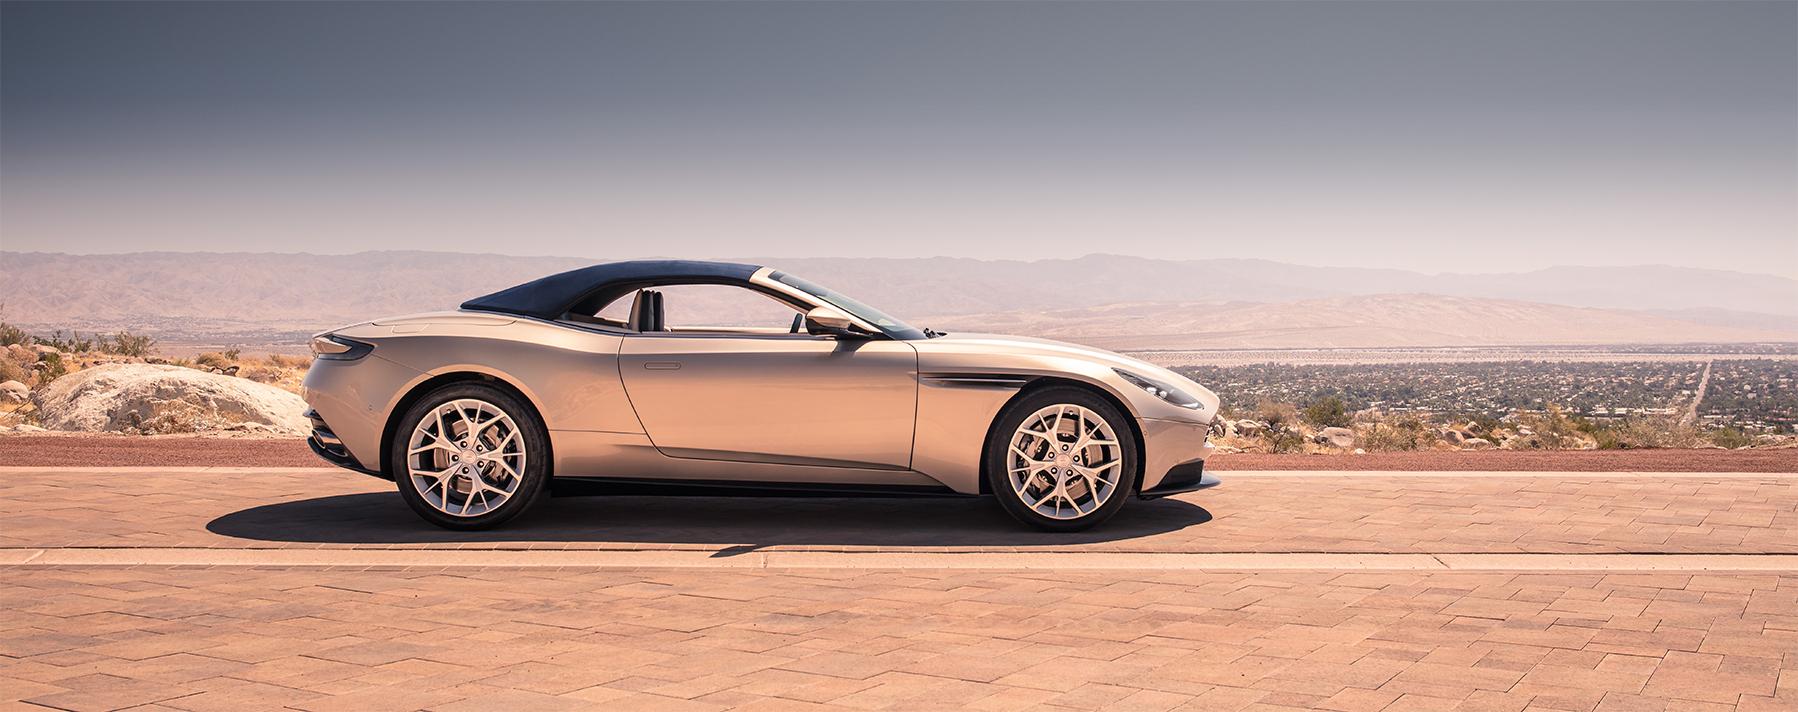 TrackWorthy - Aston Martin DB11 Volante (25)